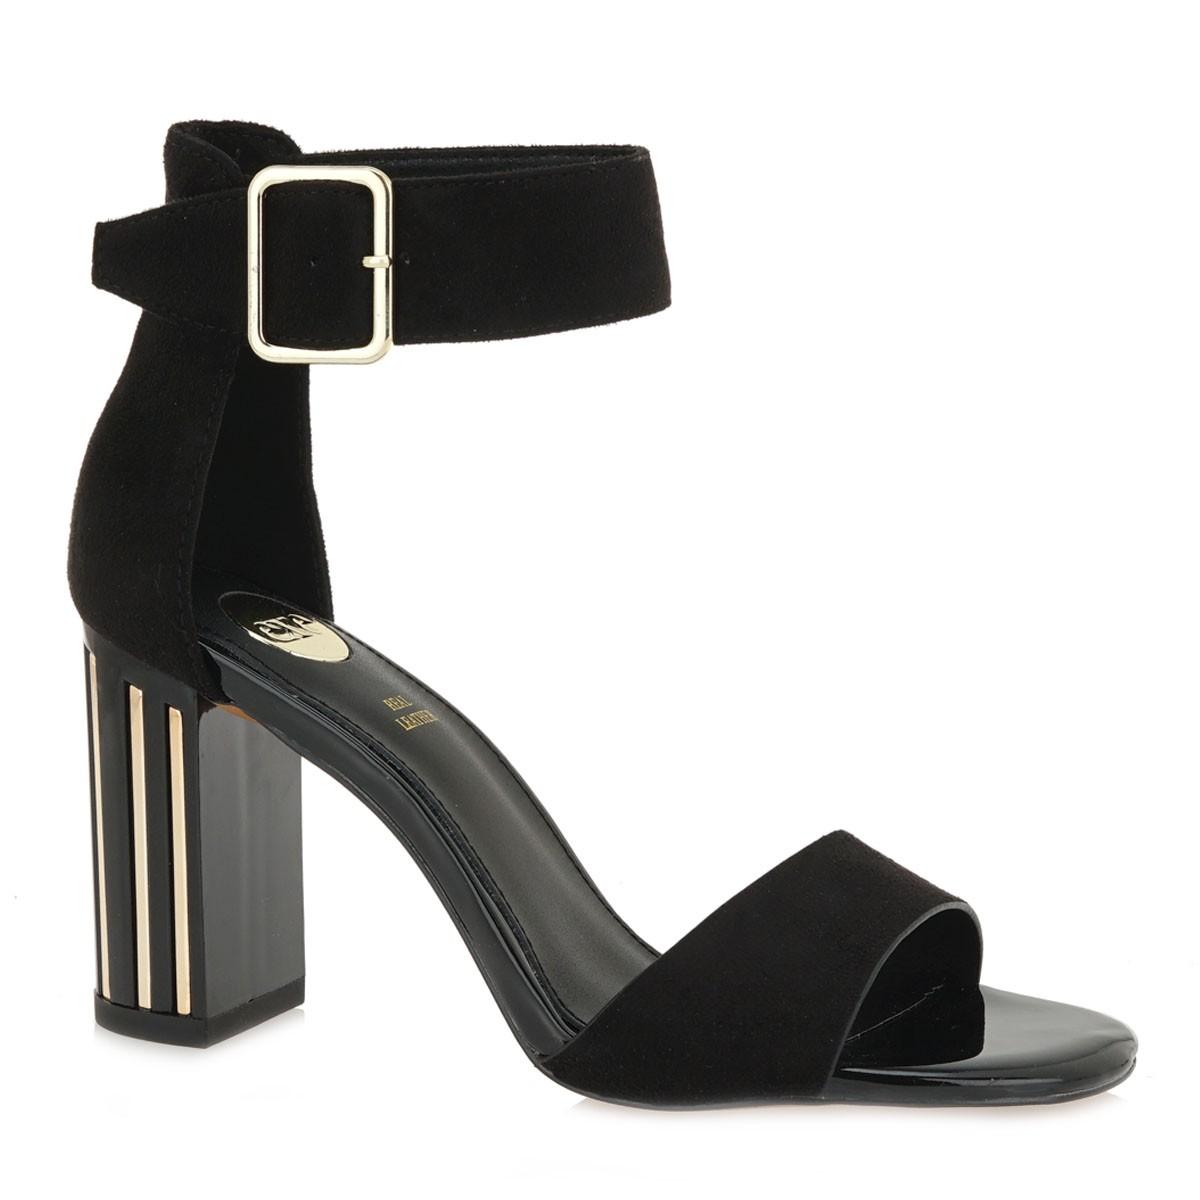 EXE Shoes Πέδιλα Γυναικεία 335-TEREZA Μαύρο Καστόρι K4700355004